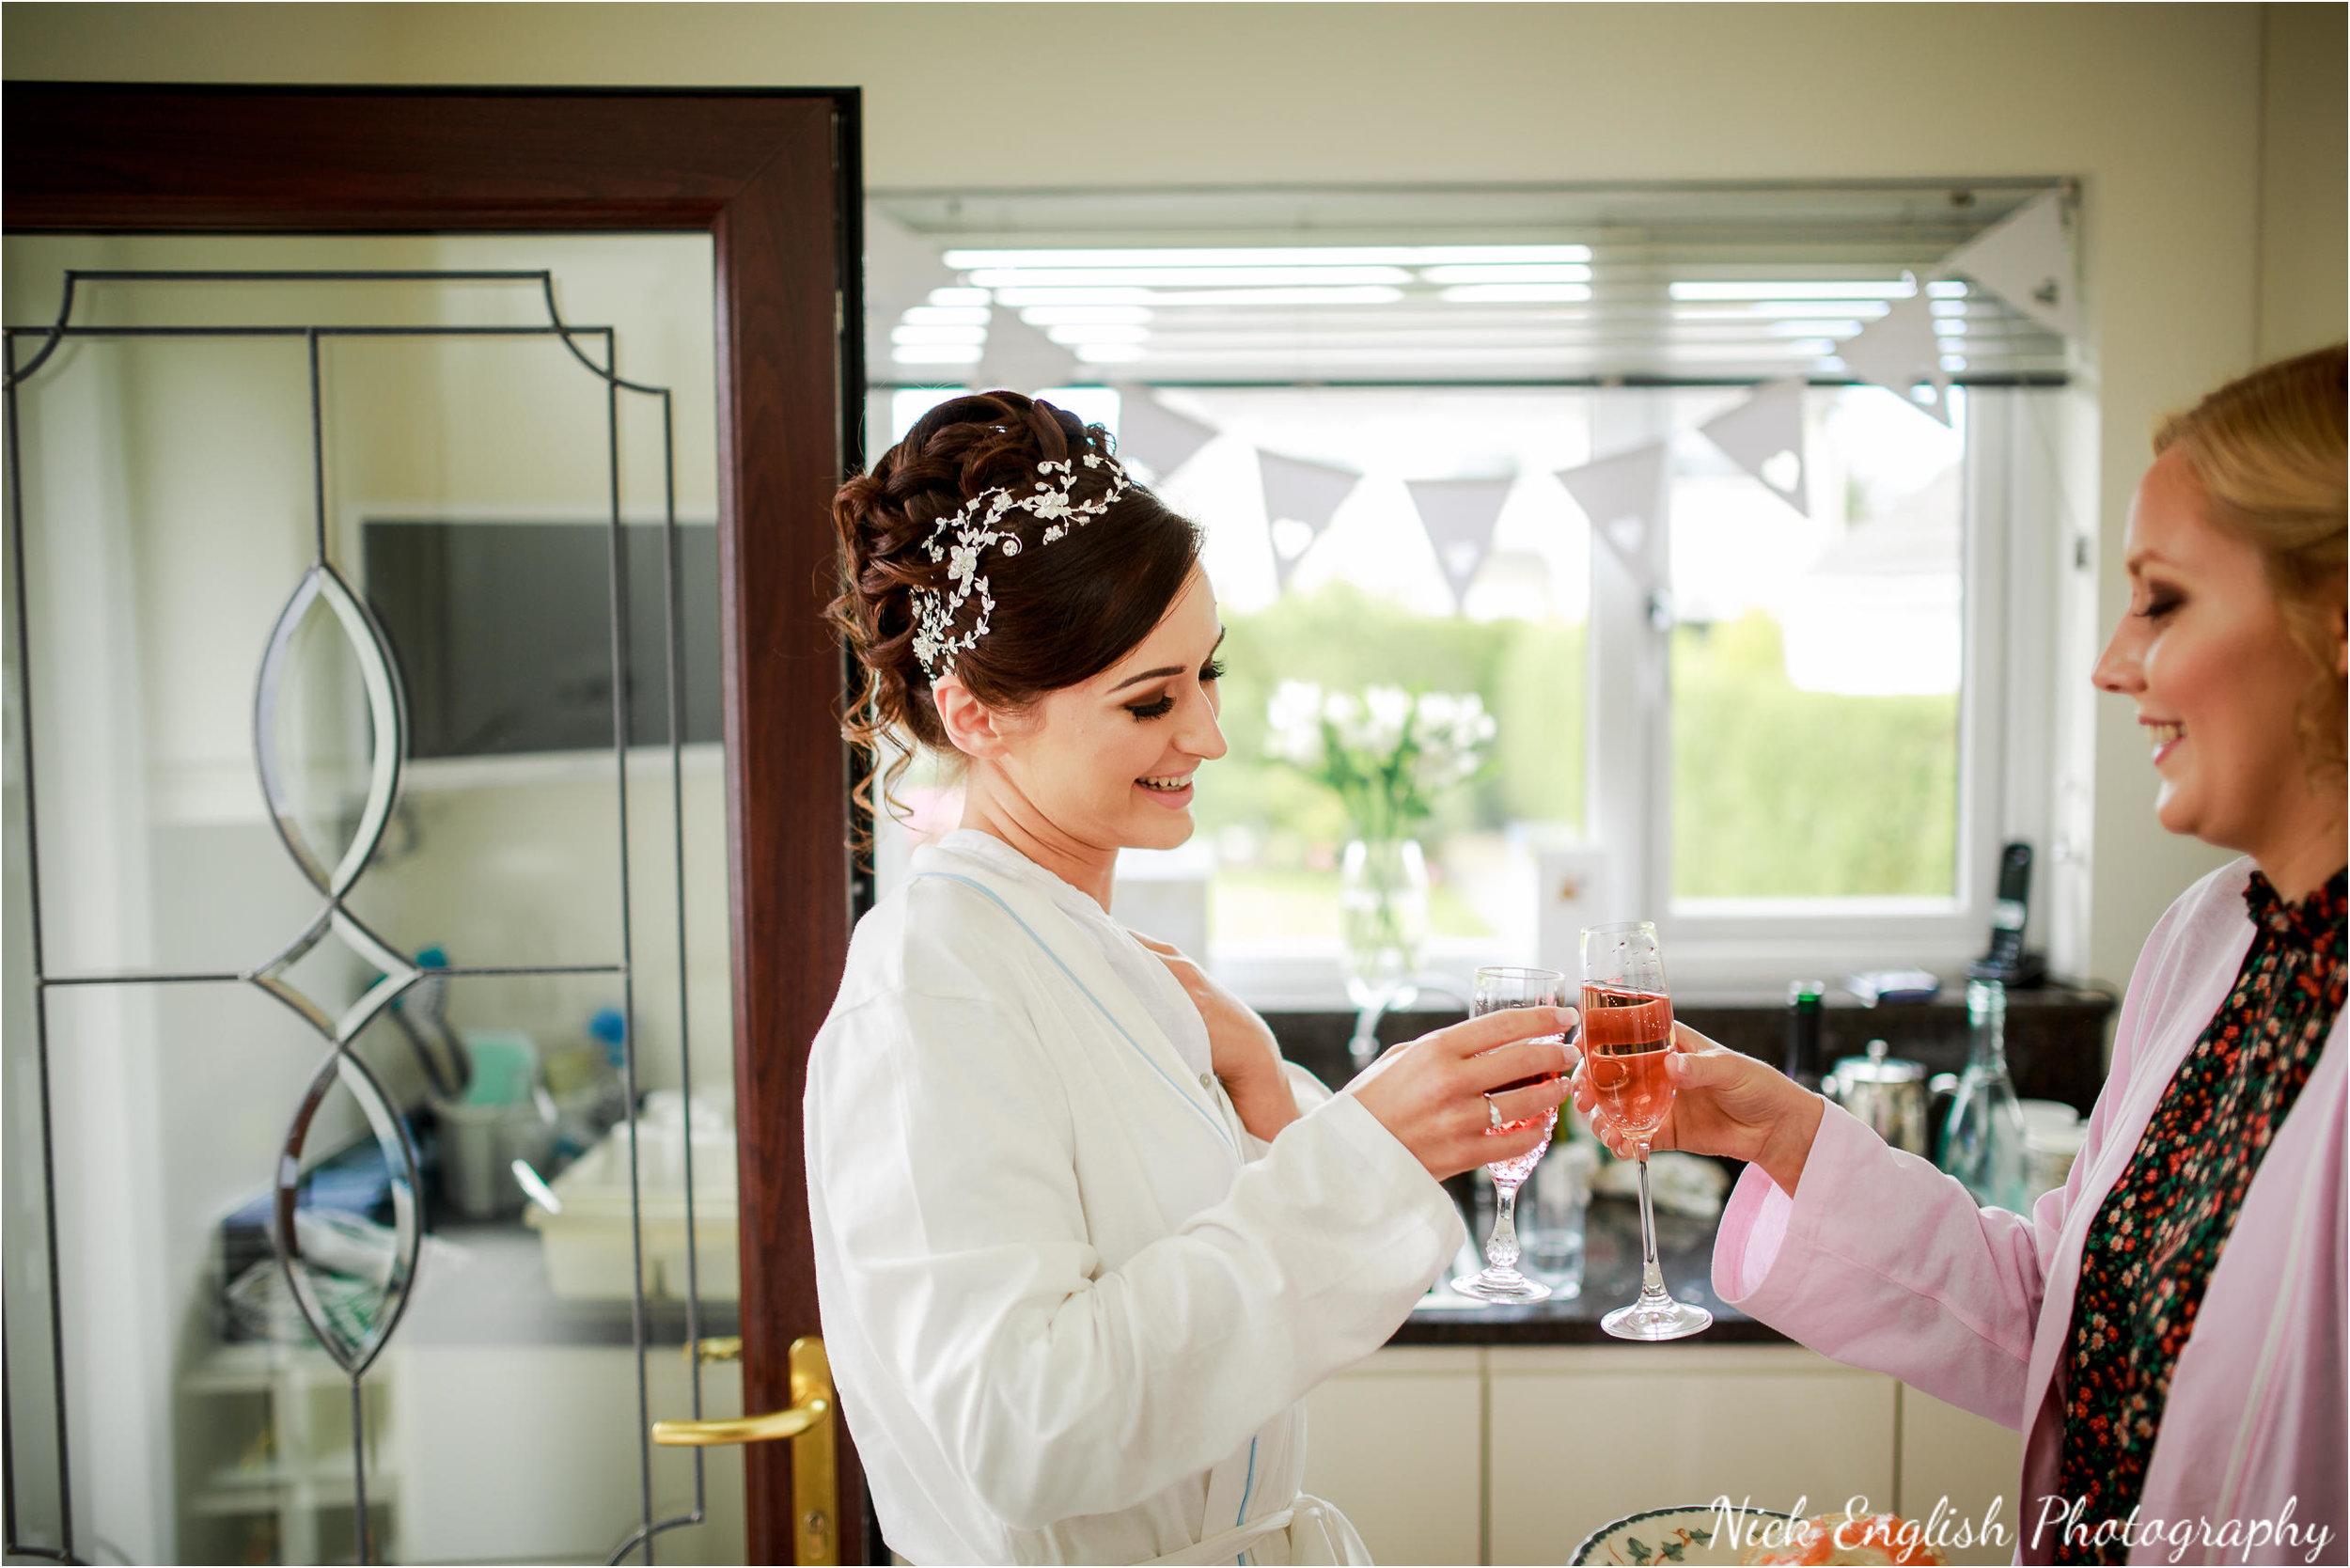 Emily David Wedding Photographs at Barton Grange Preston by Nick English Photography 27jpg.jpeg